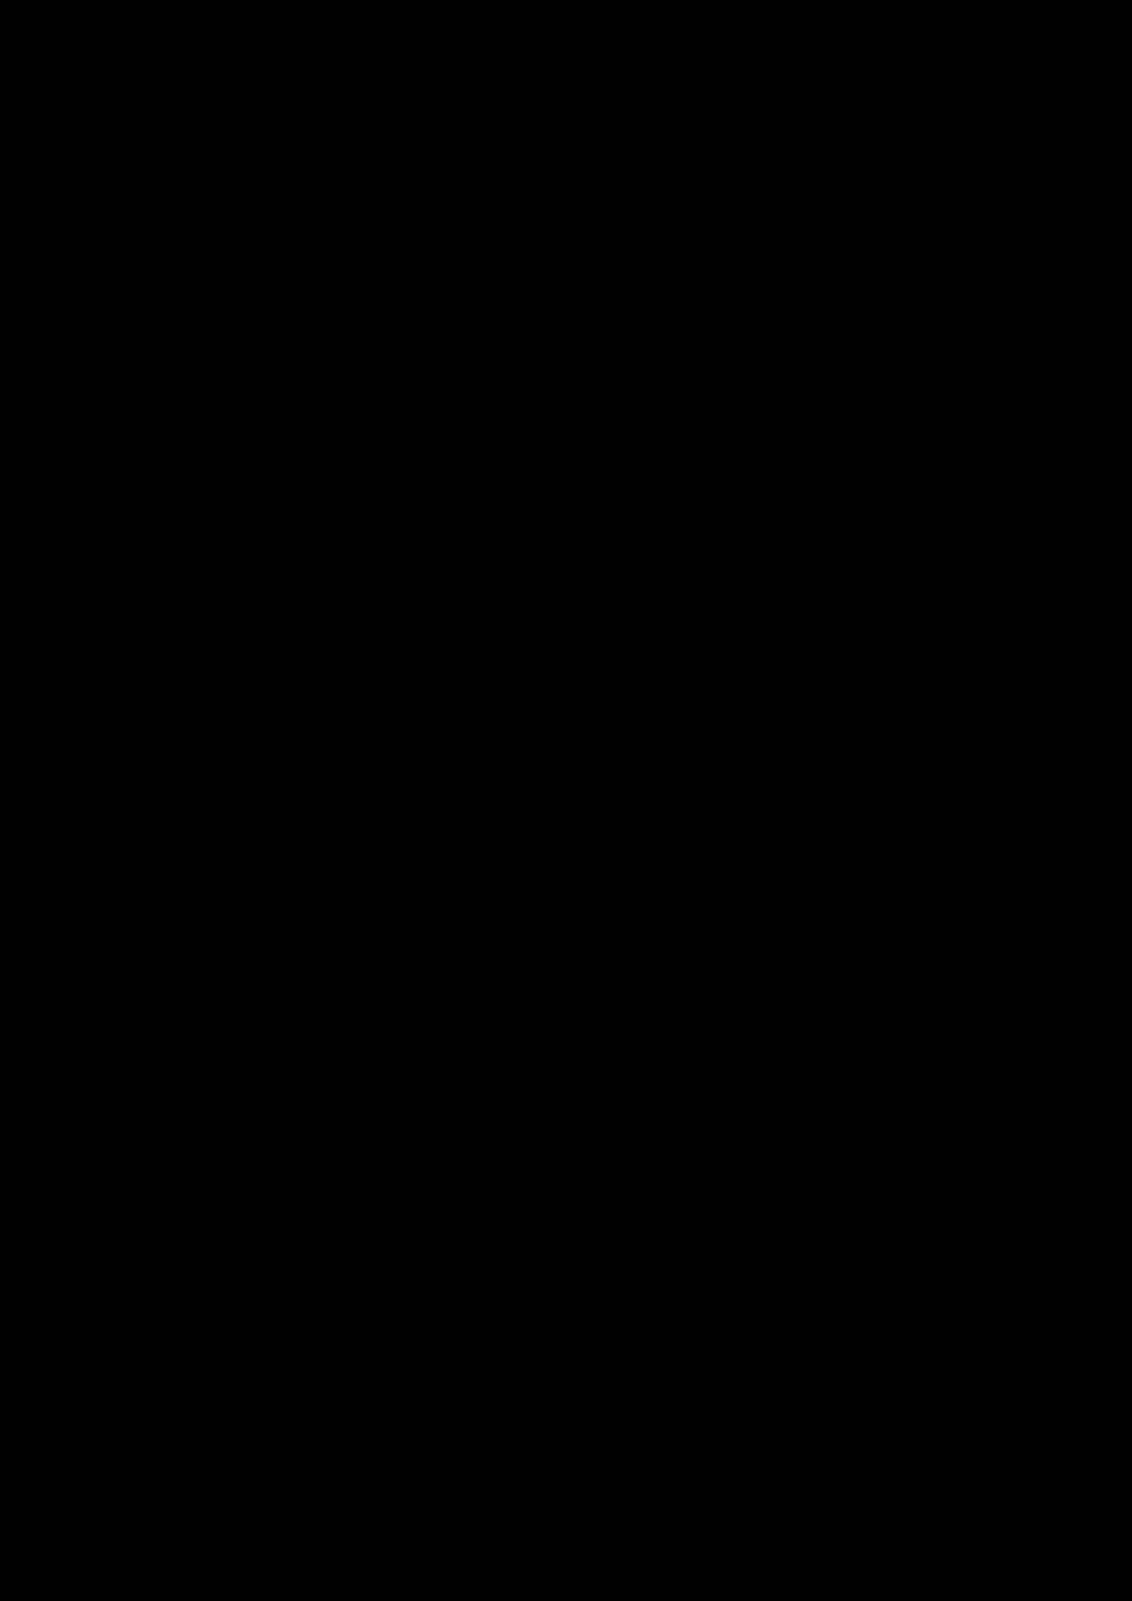 Belyiy sokol slide, Image 31